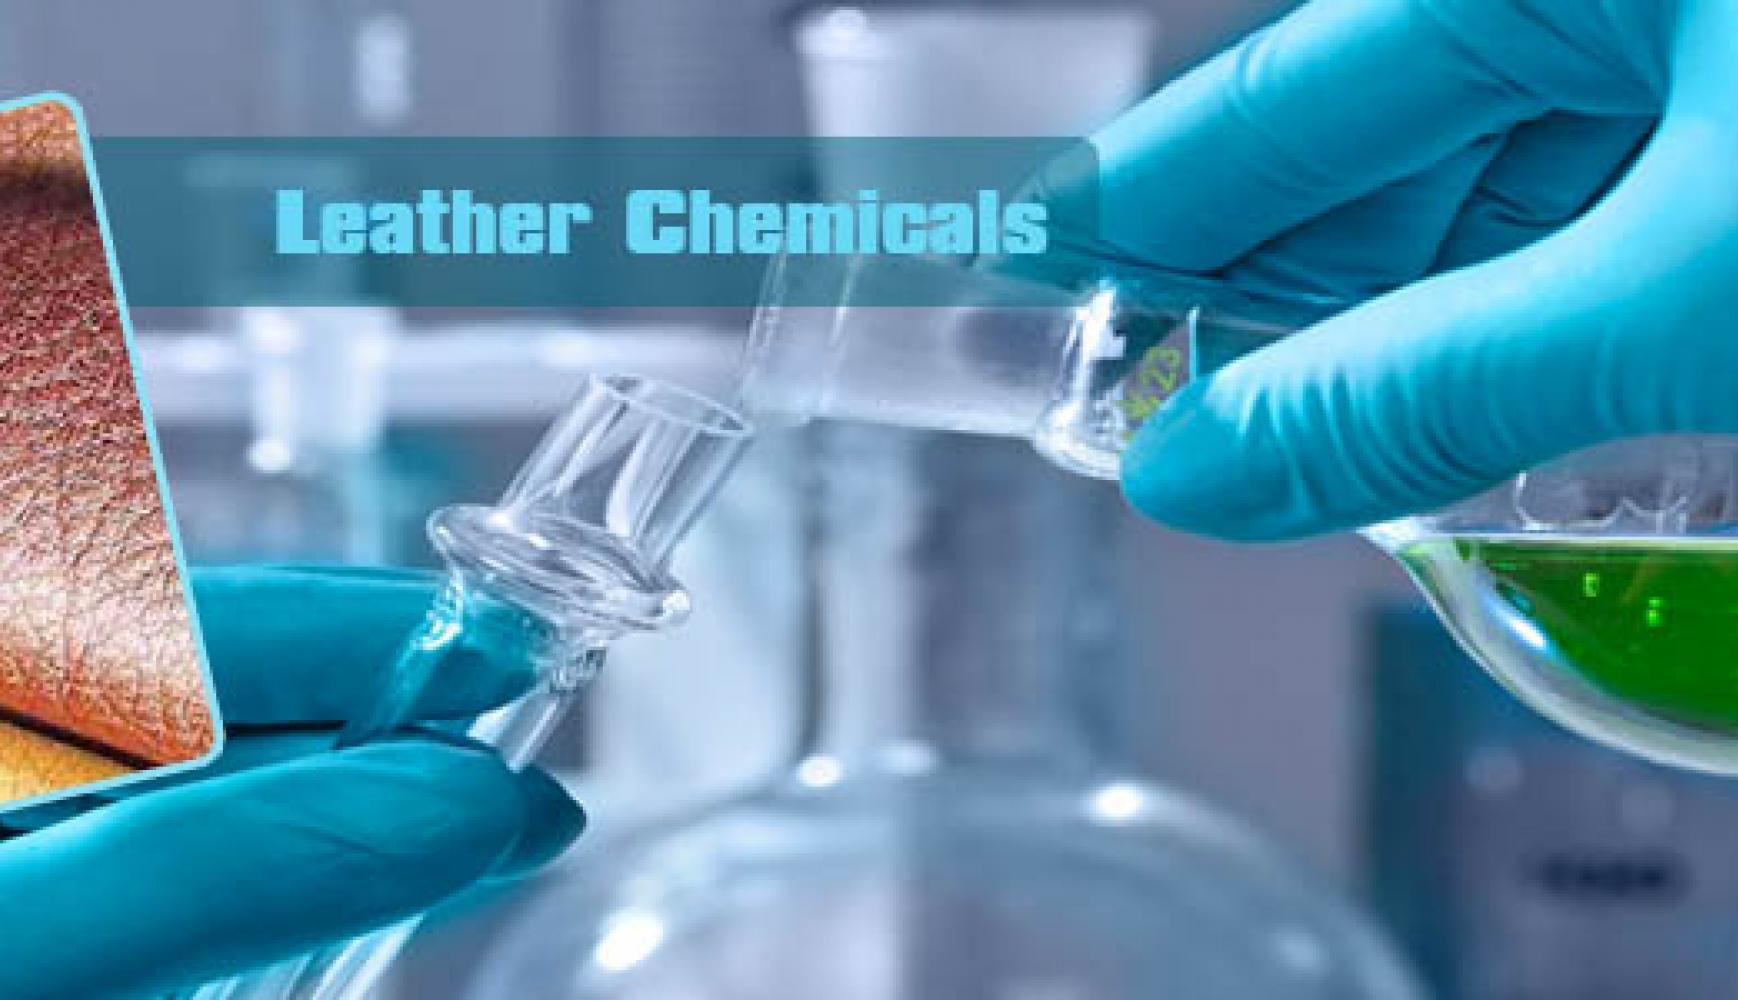 Leather Chemicals Supplier in Dubai, Fujairah, Sharjah, Ajman, RAK